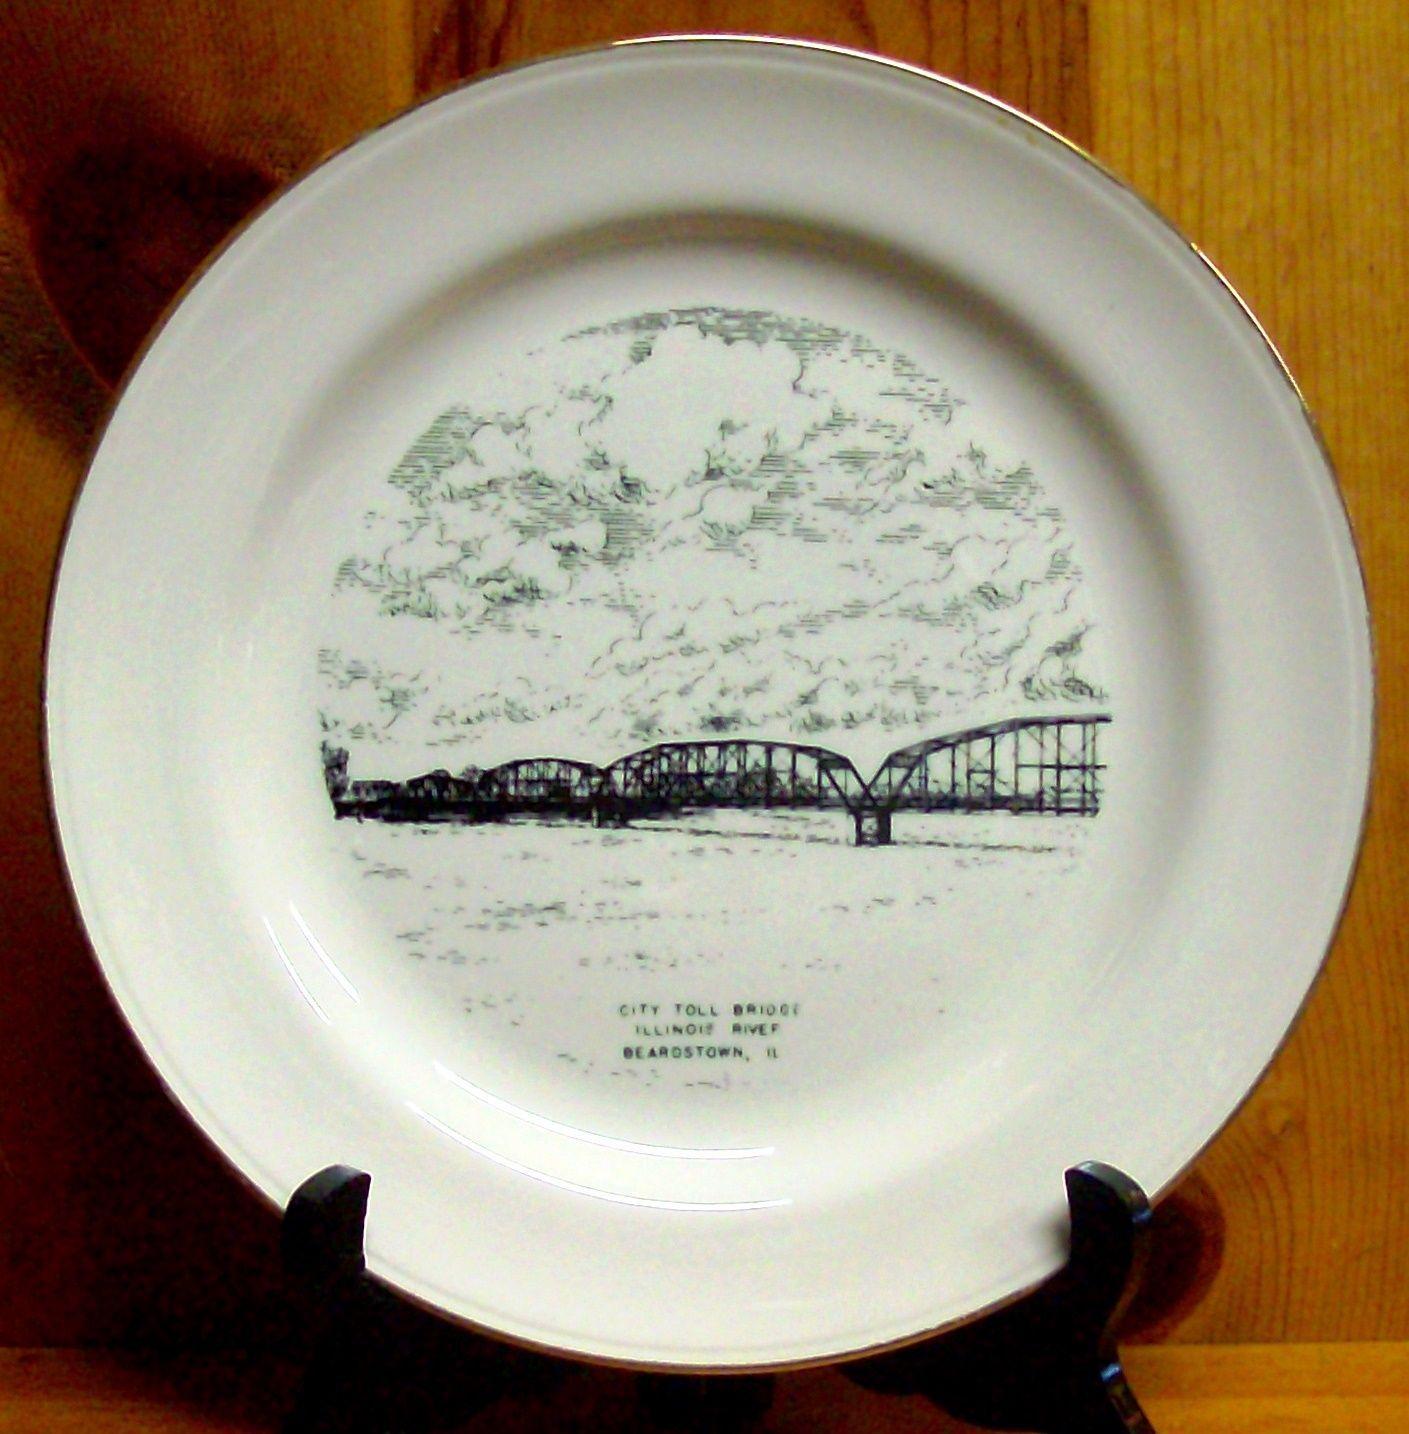 Vintage Beardstown, IL Illinois City Toll Bridge IL River Collector's Plate